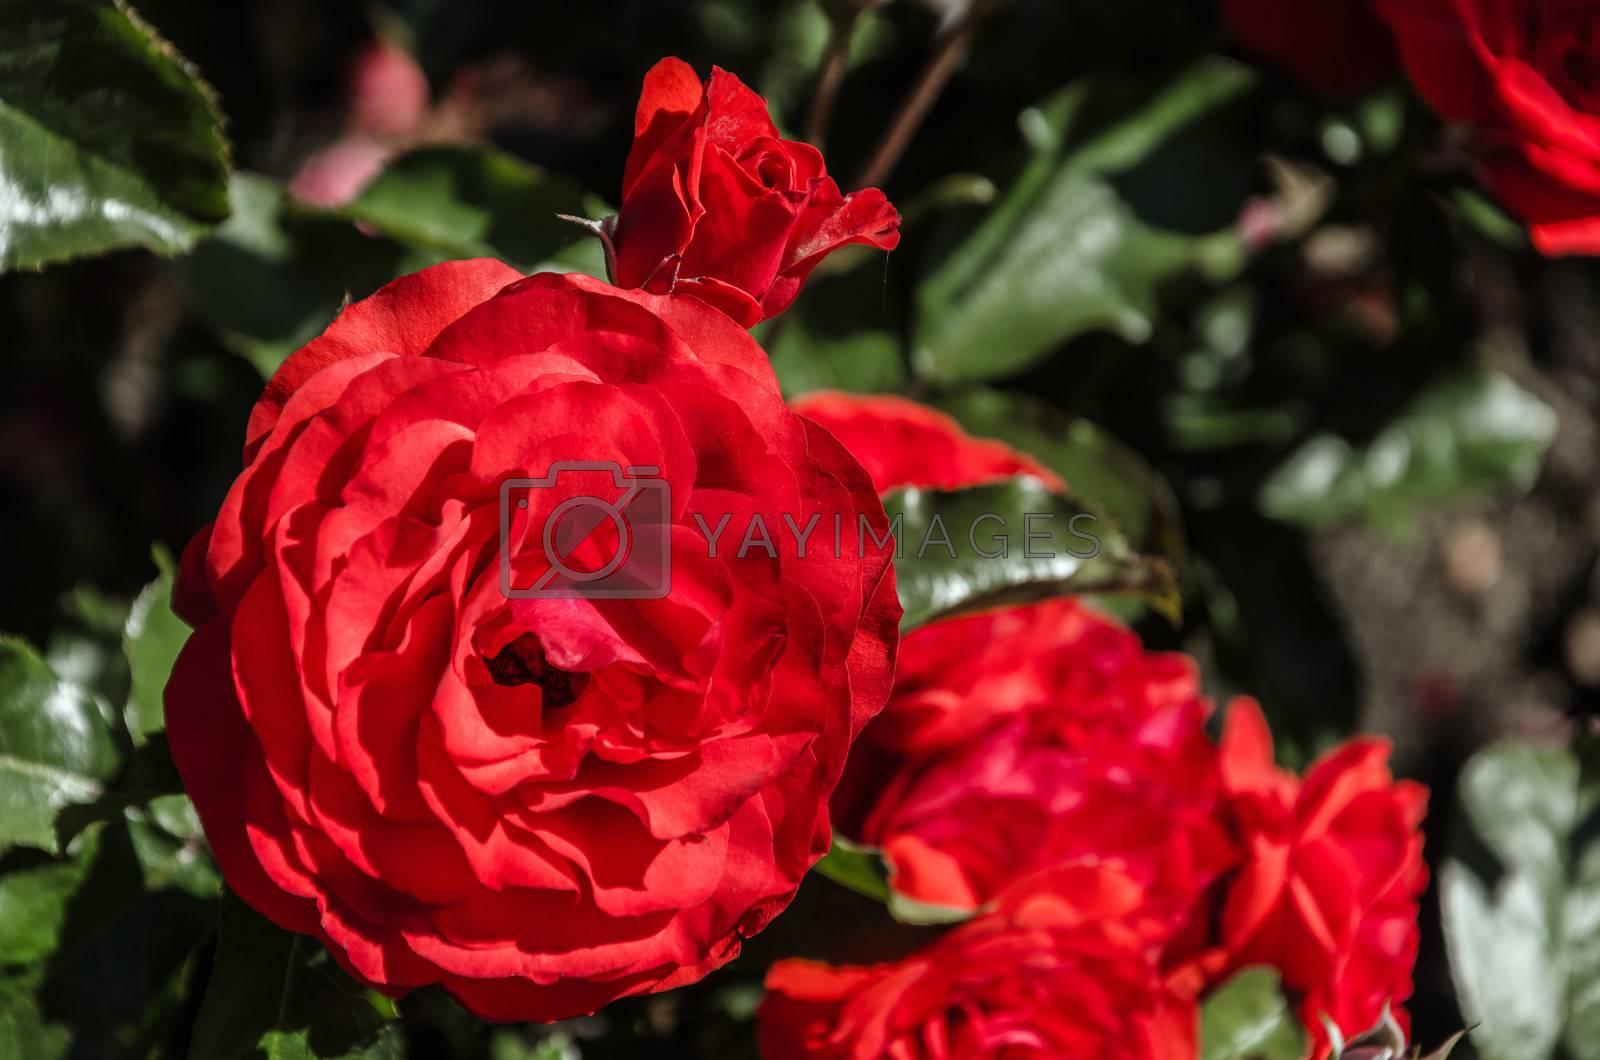 A red rose in the International Rose Test Garden in Portland, Oregon